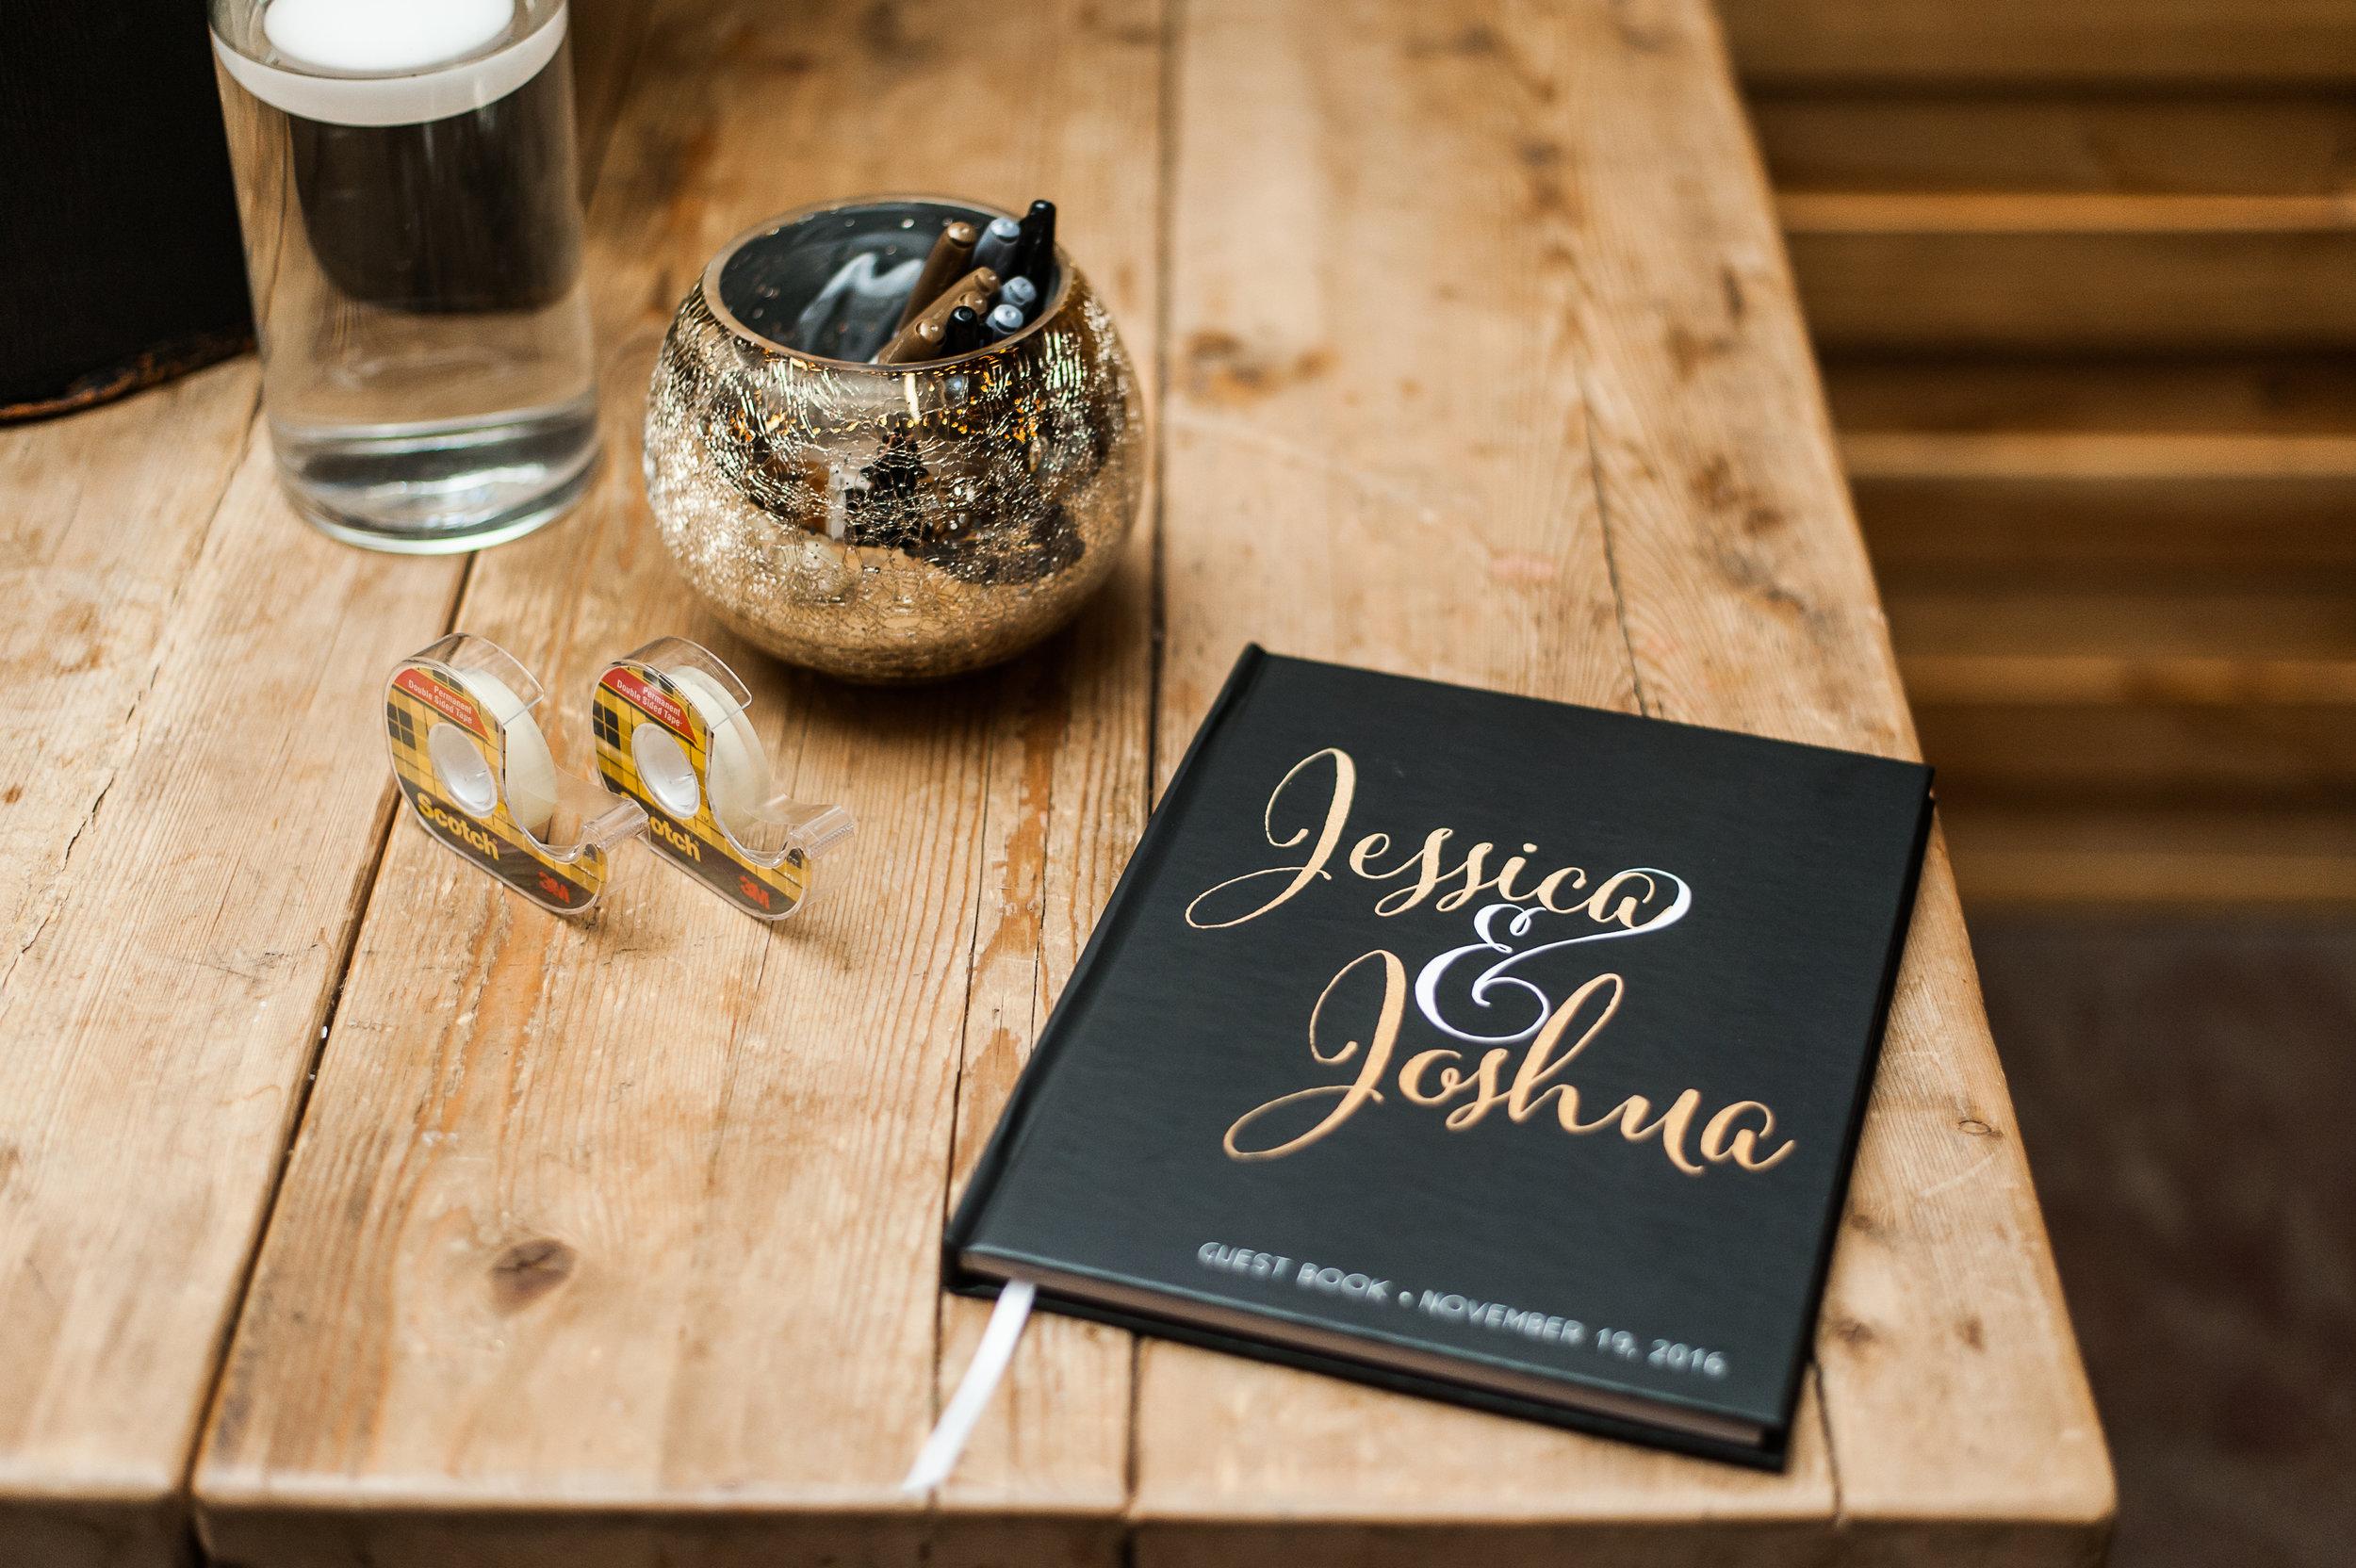 JJ-wedding-Van-Wyhe-Photography-259.jpg